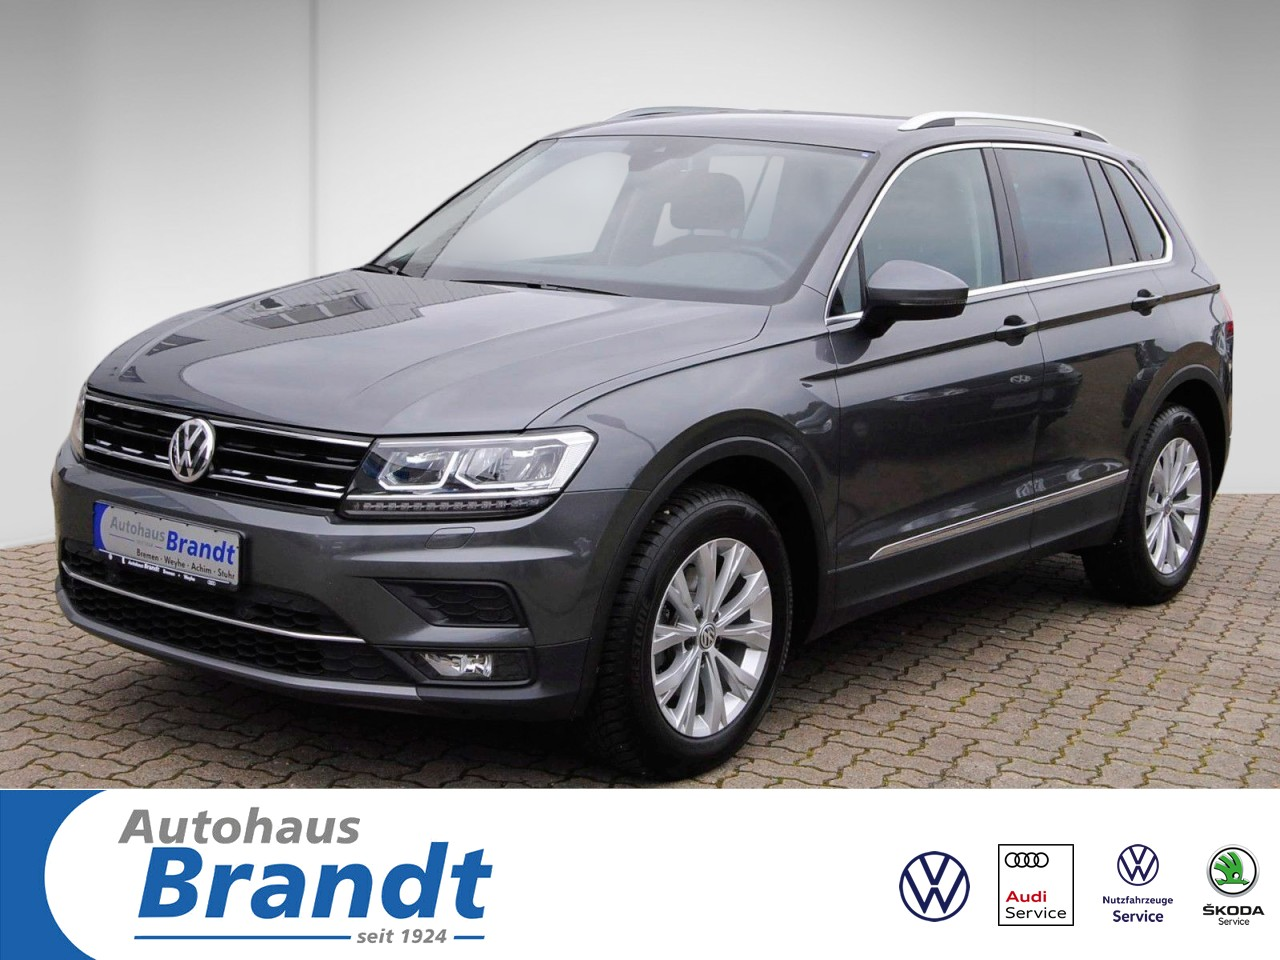 Volkswagen Tiguan 2.0 TDI Highline DSG *LED*NAVI*AHK*DYNAUDIO, Jahr 2018, Diesel